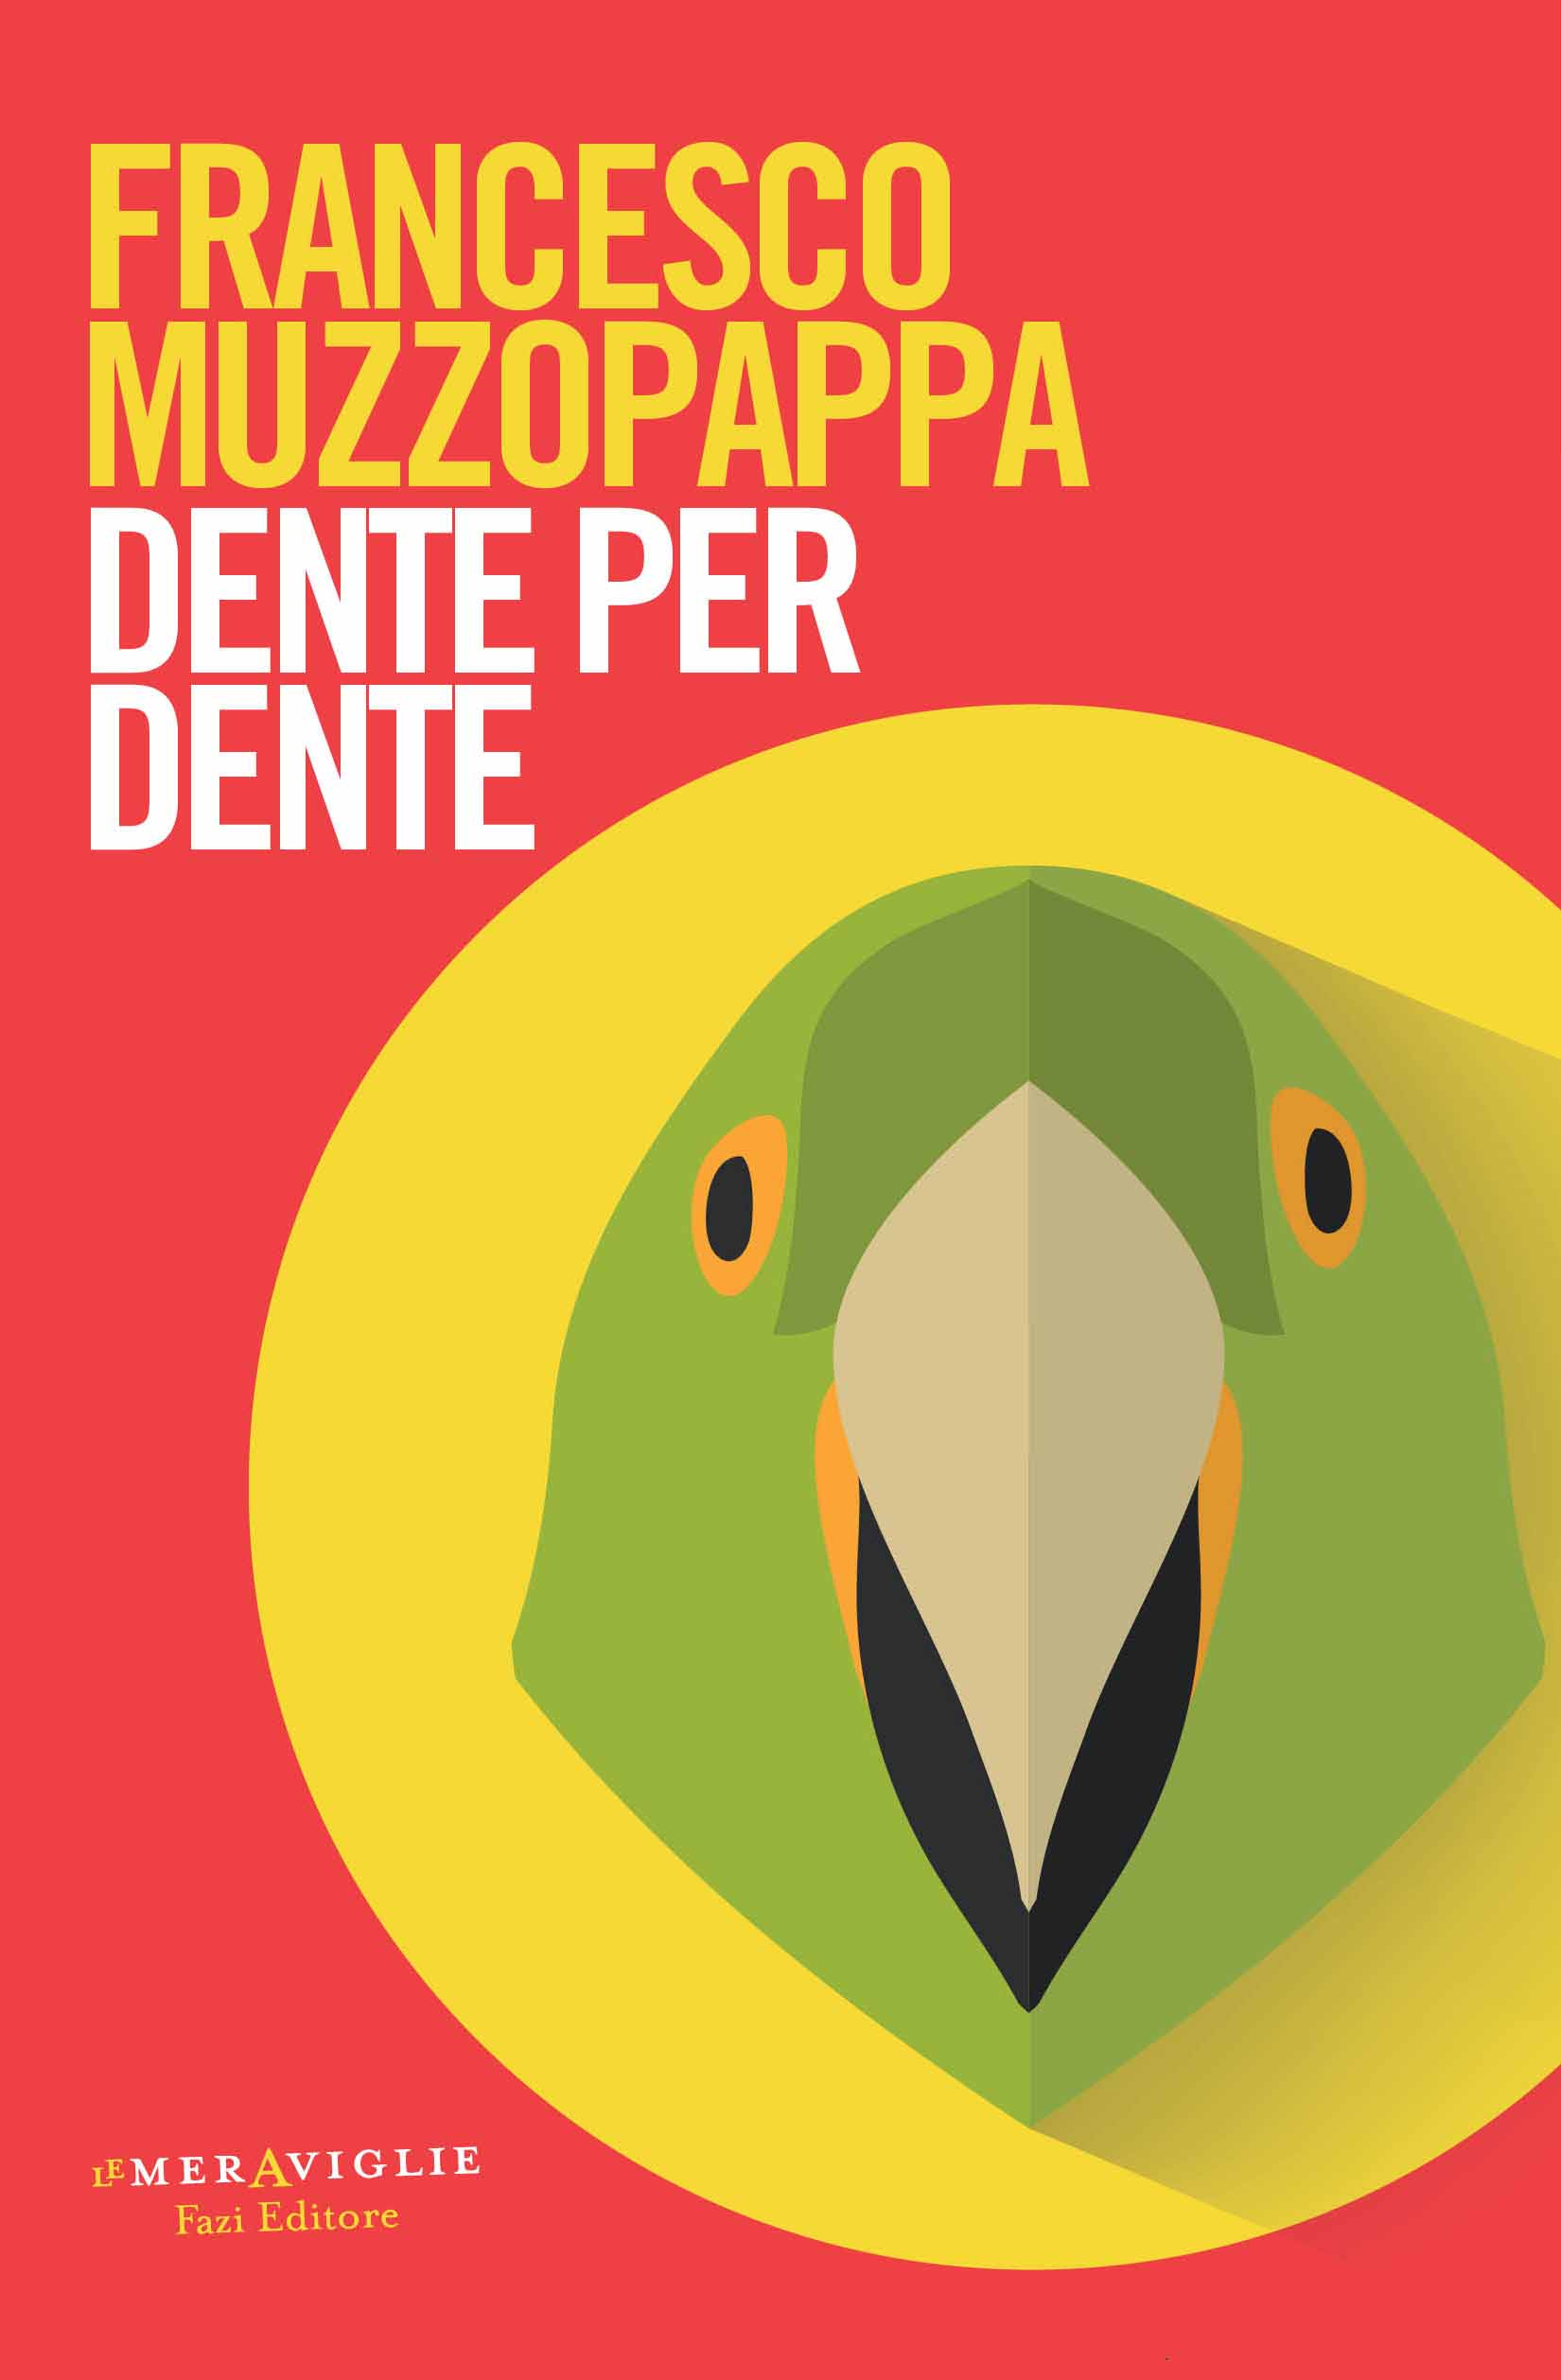 Dente per dente – Francesco Muzzopappa